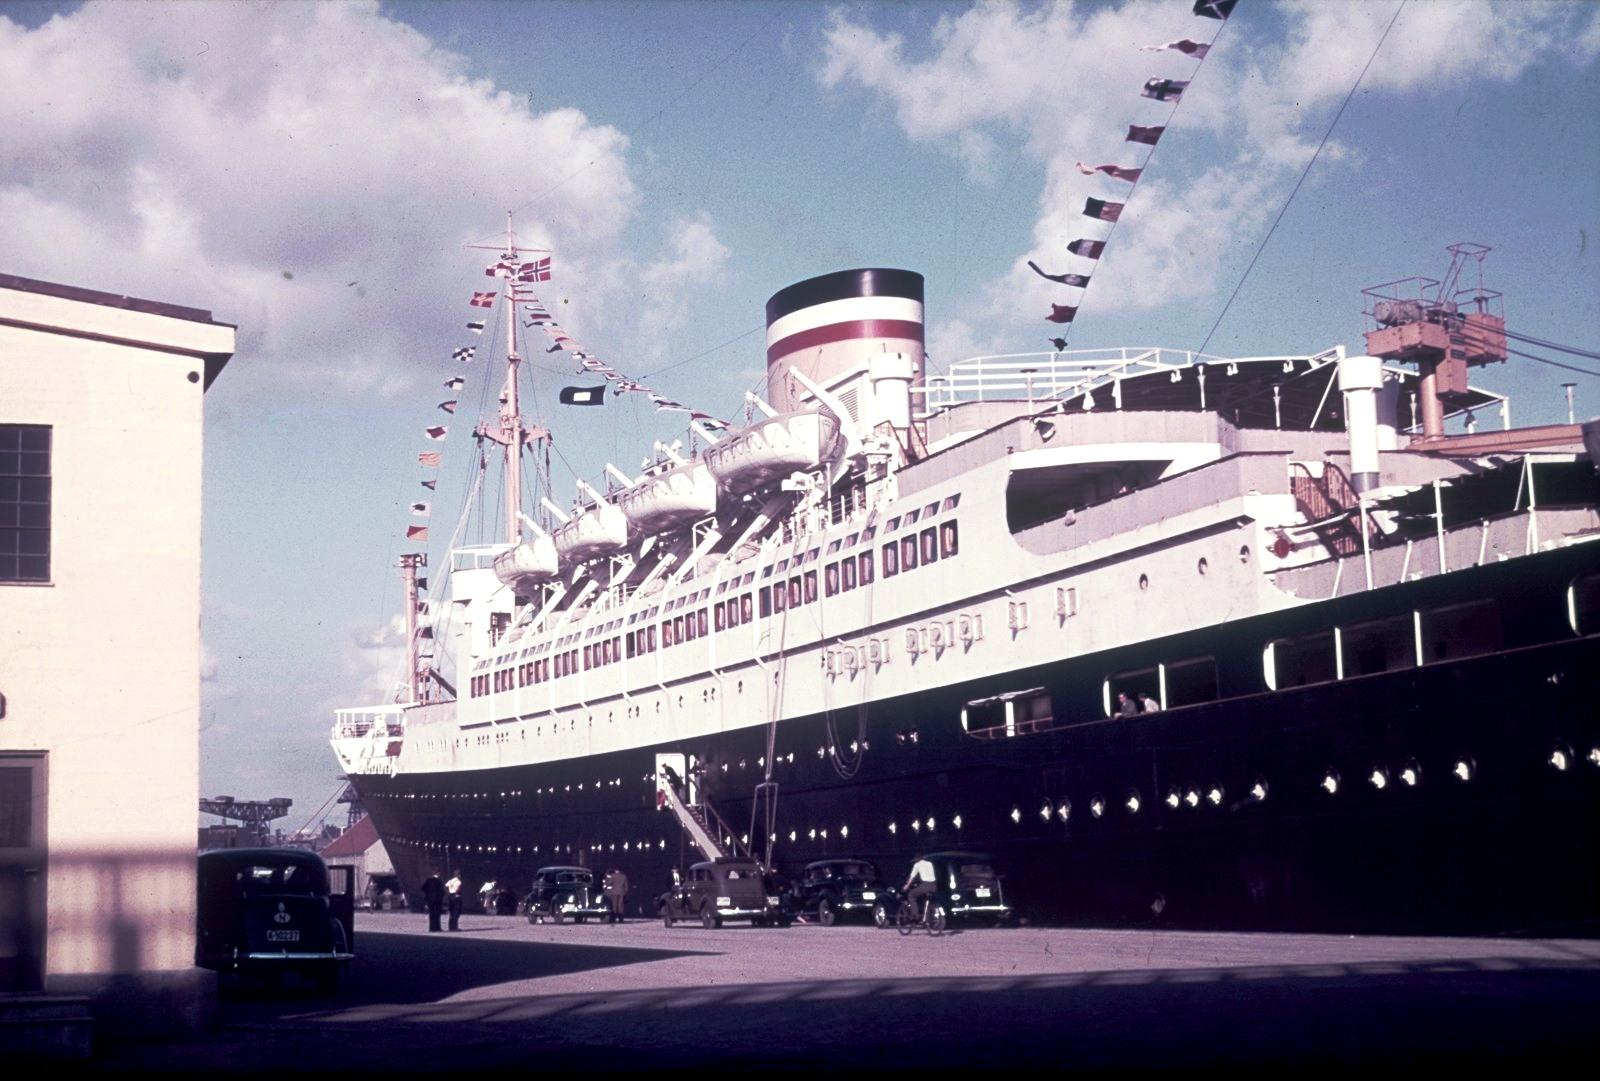 Осло. Пассажирское судно «Patria» (1938) в гавани